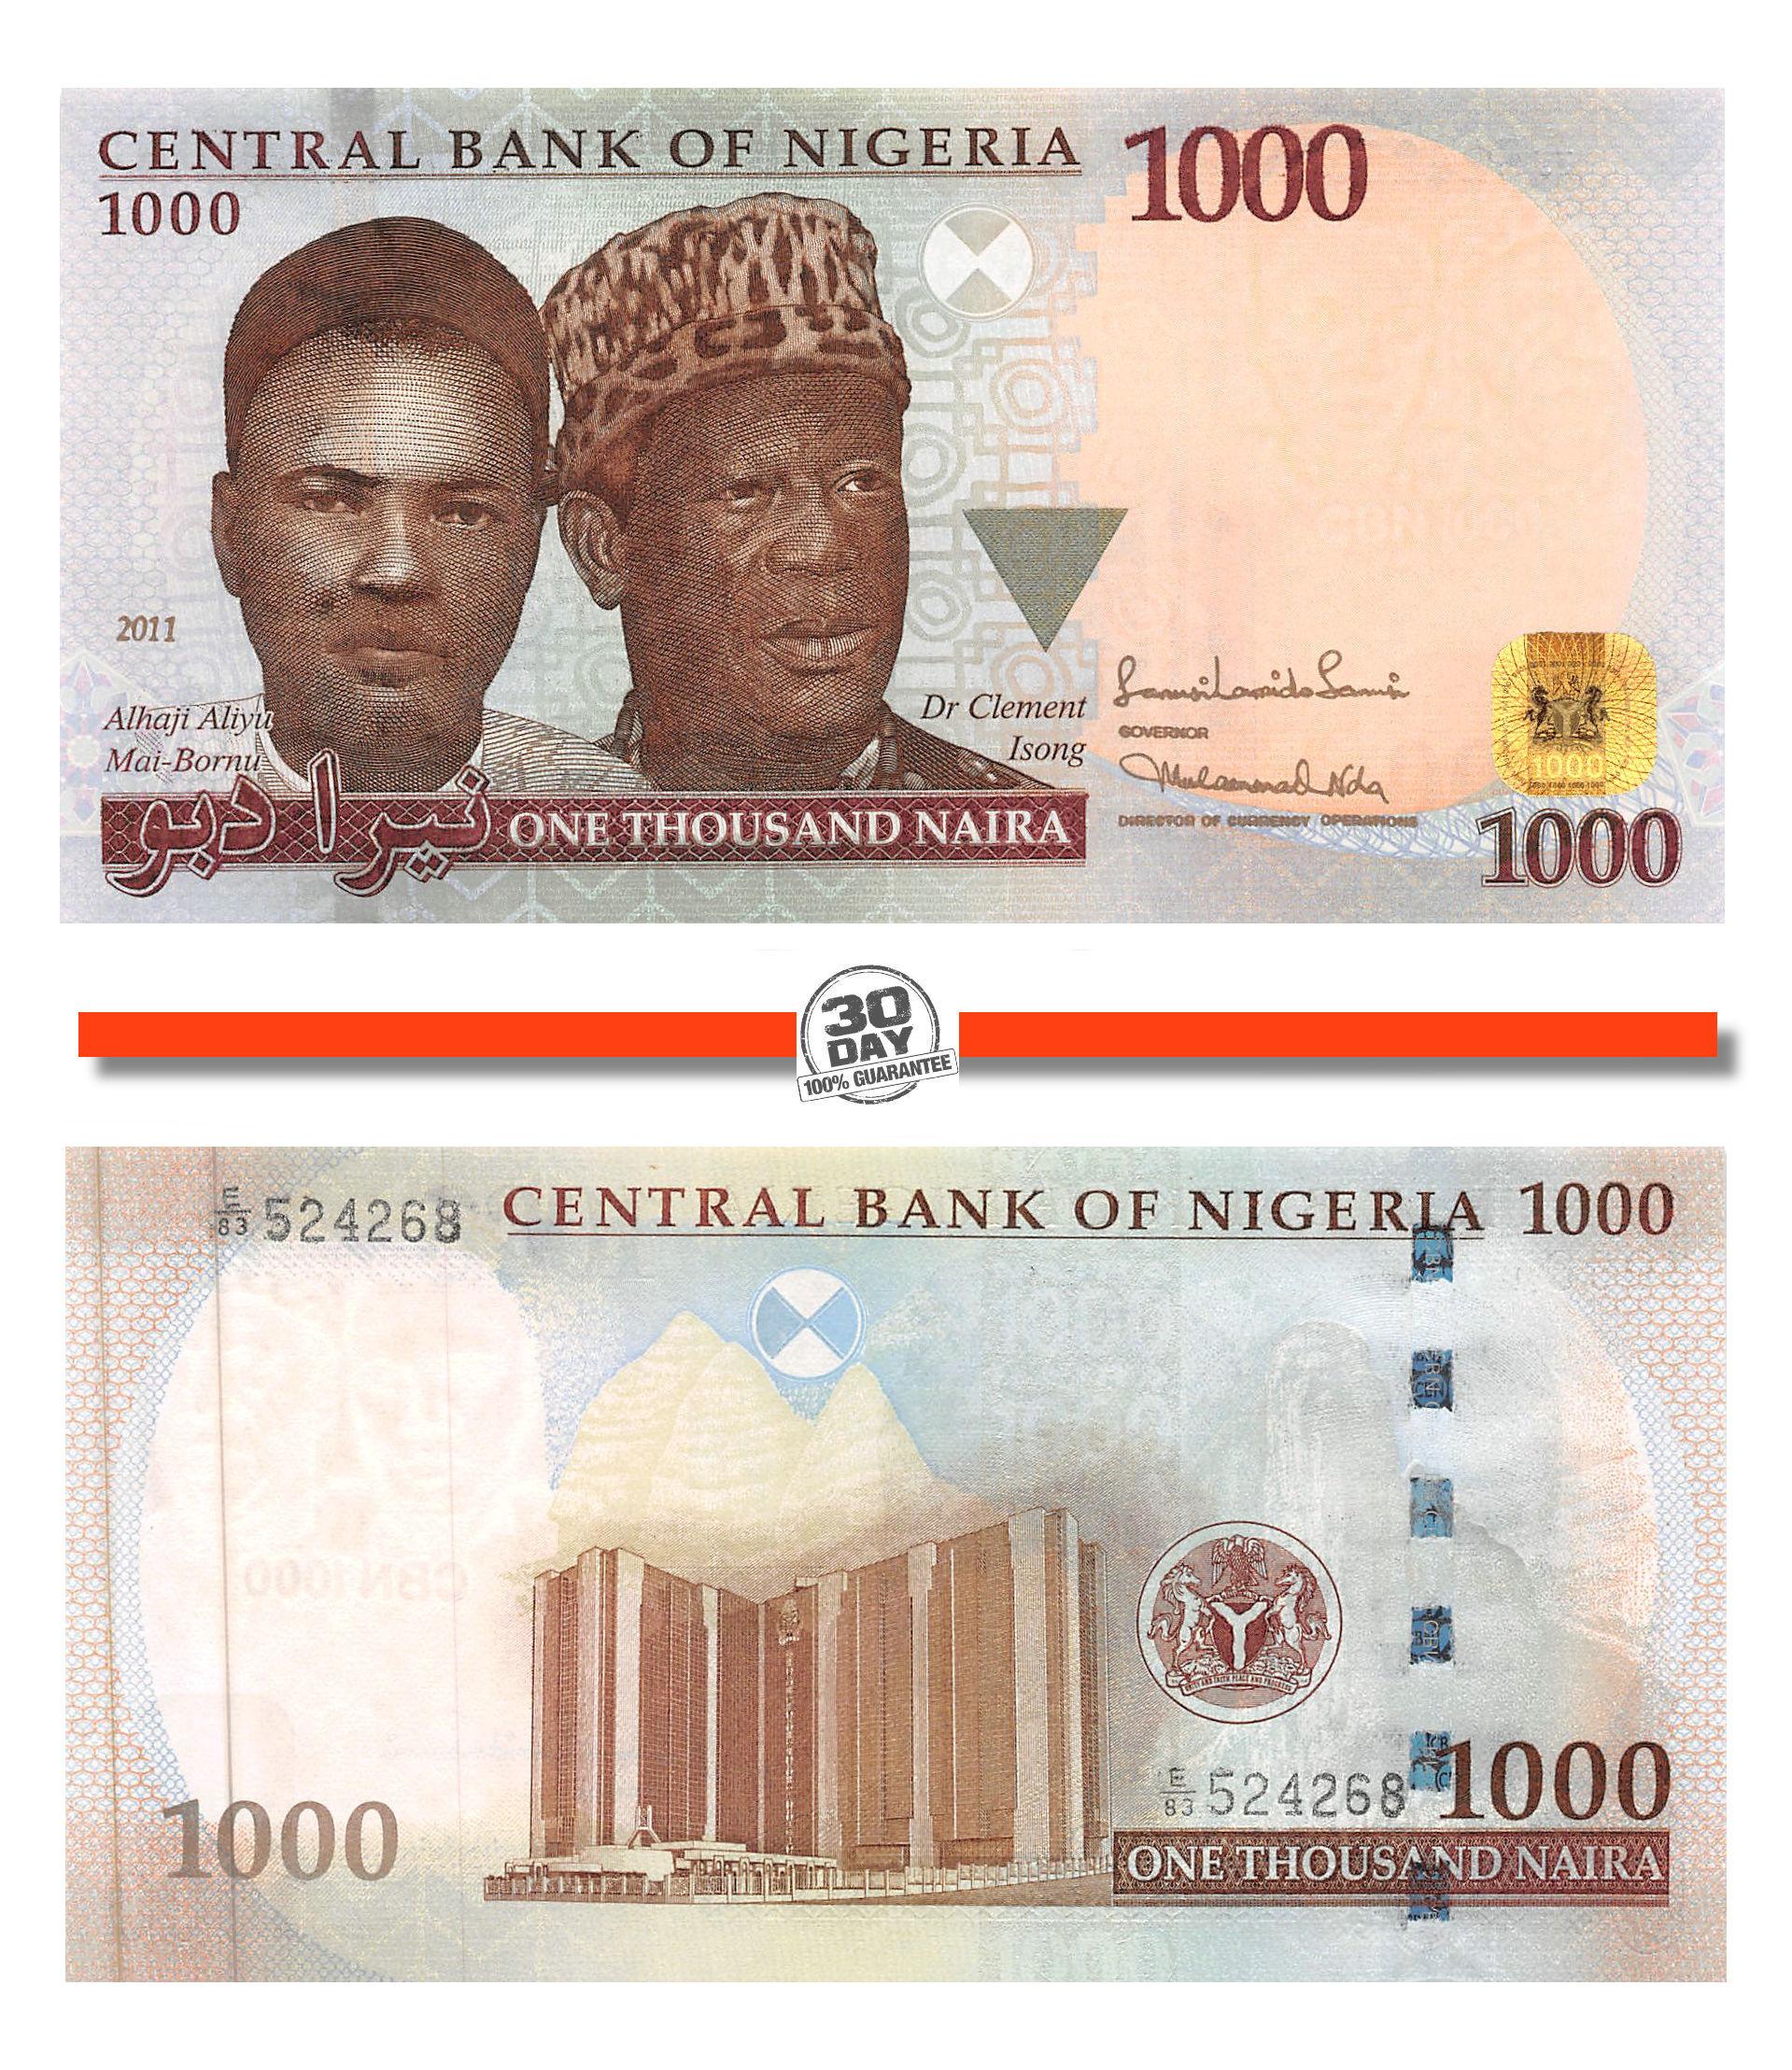 2011 Nigeria 100 Naira Uncirculated Note